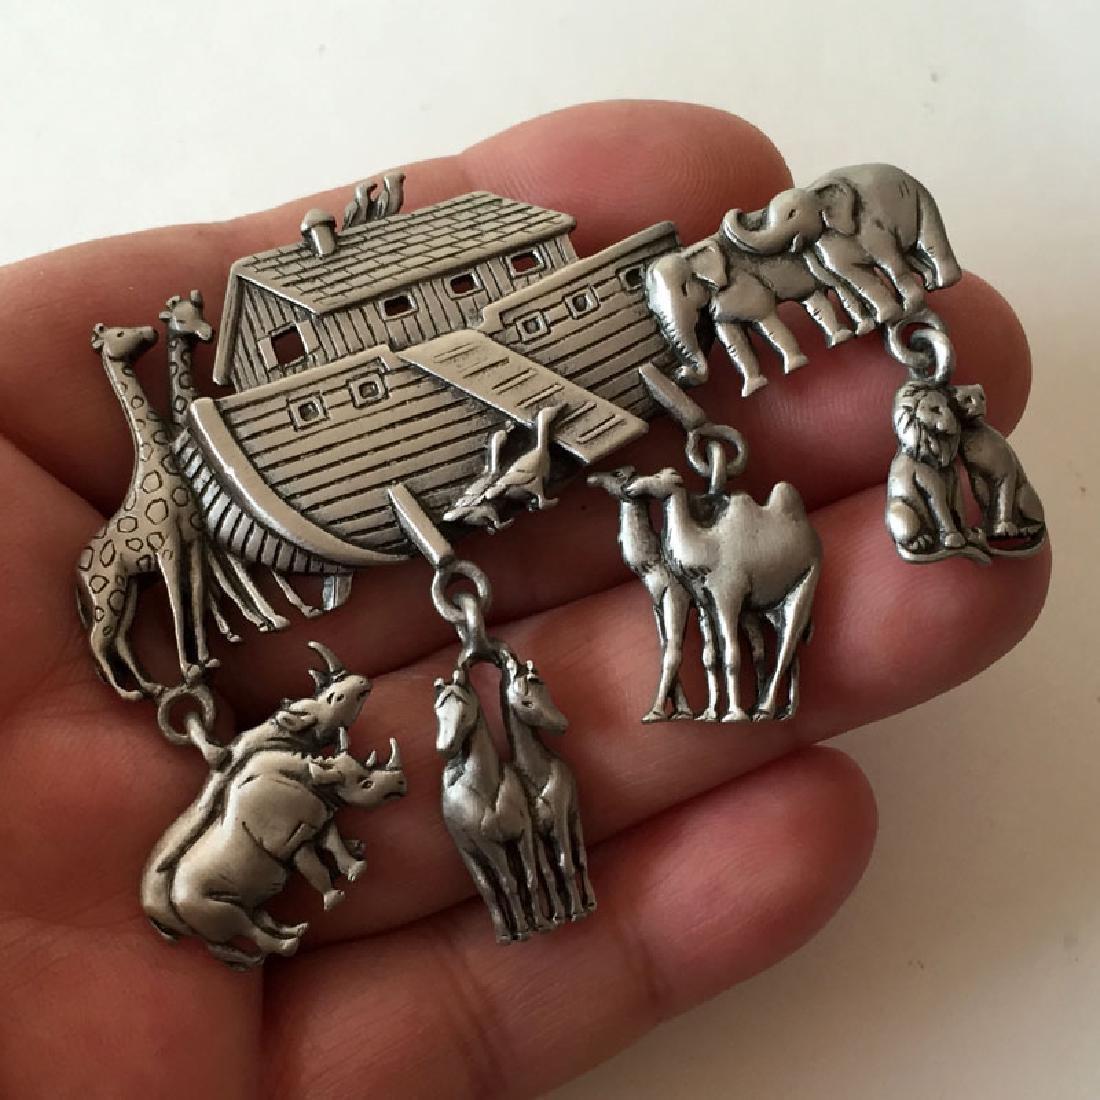 J.J.: Silver tone satin finish NOEV KOVCHEG brooch with